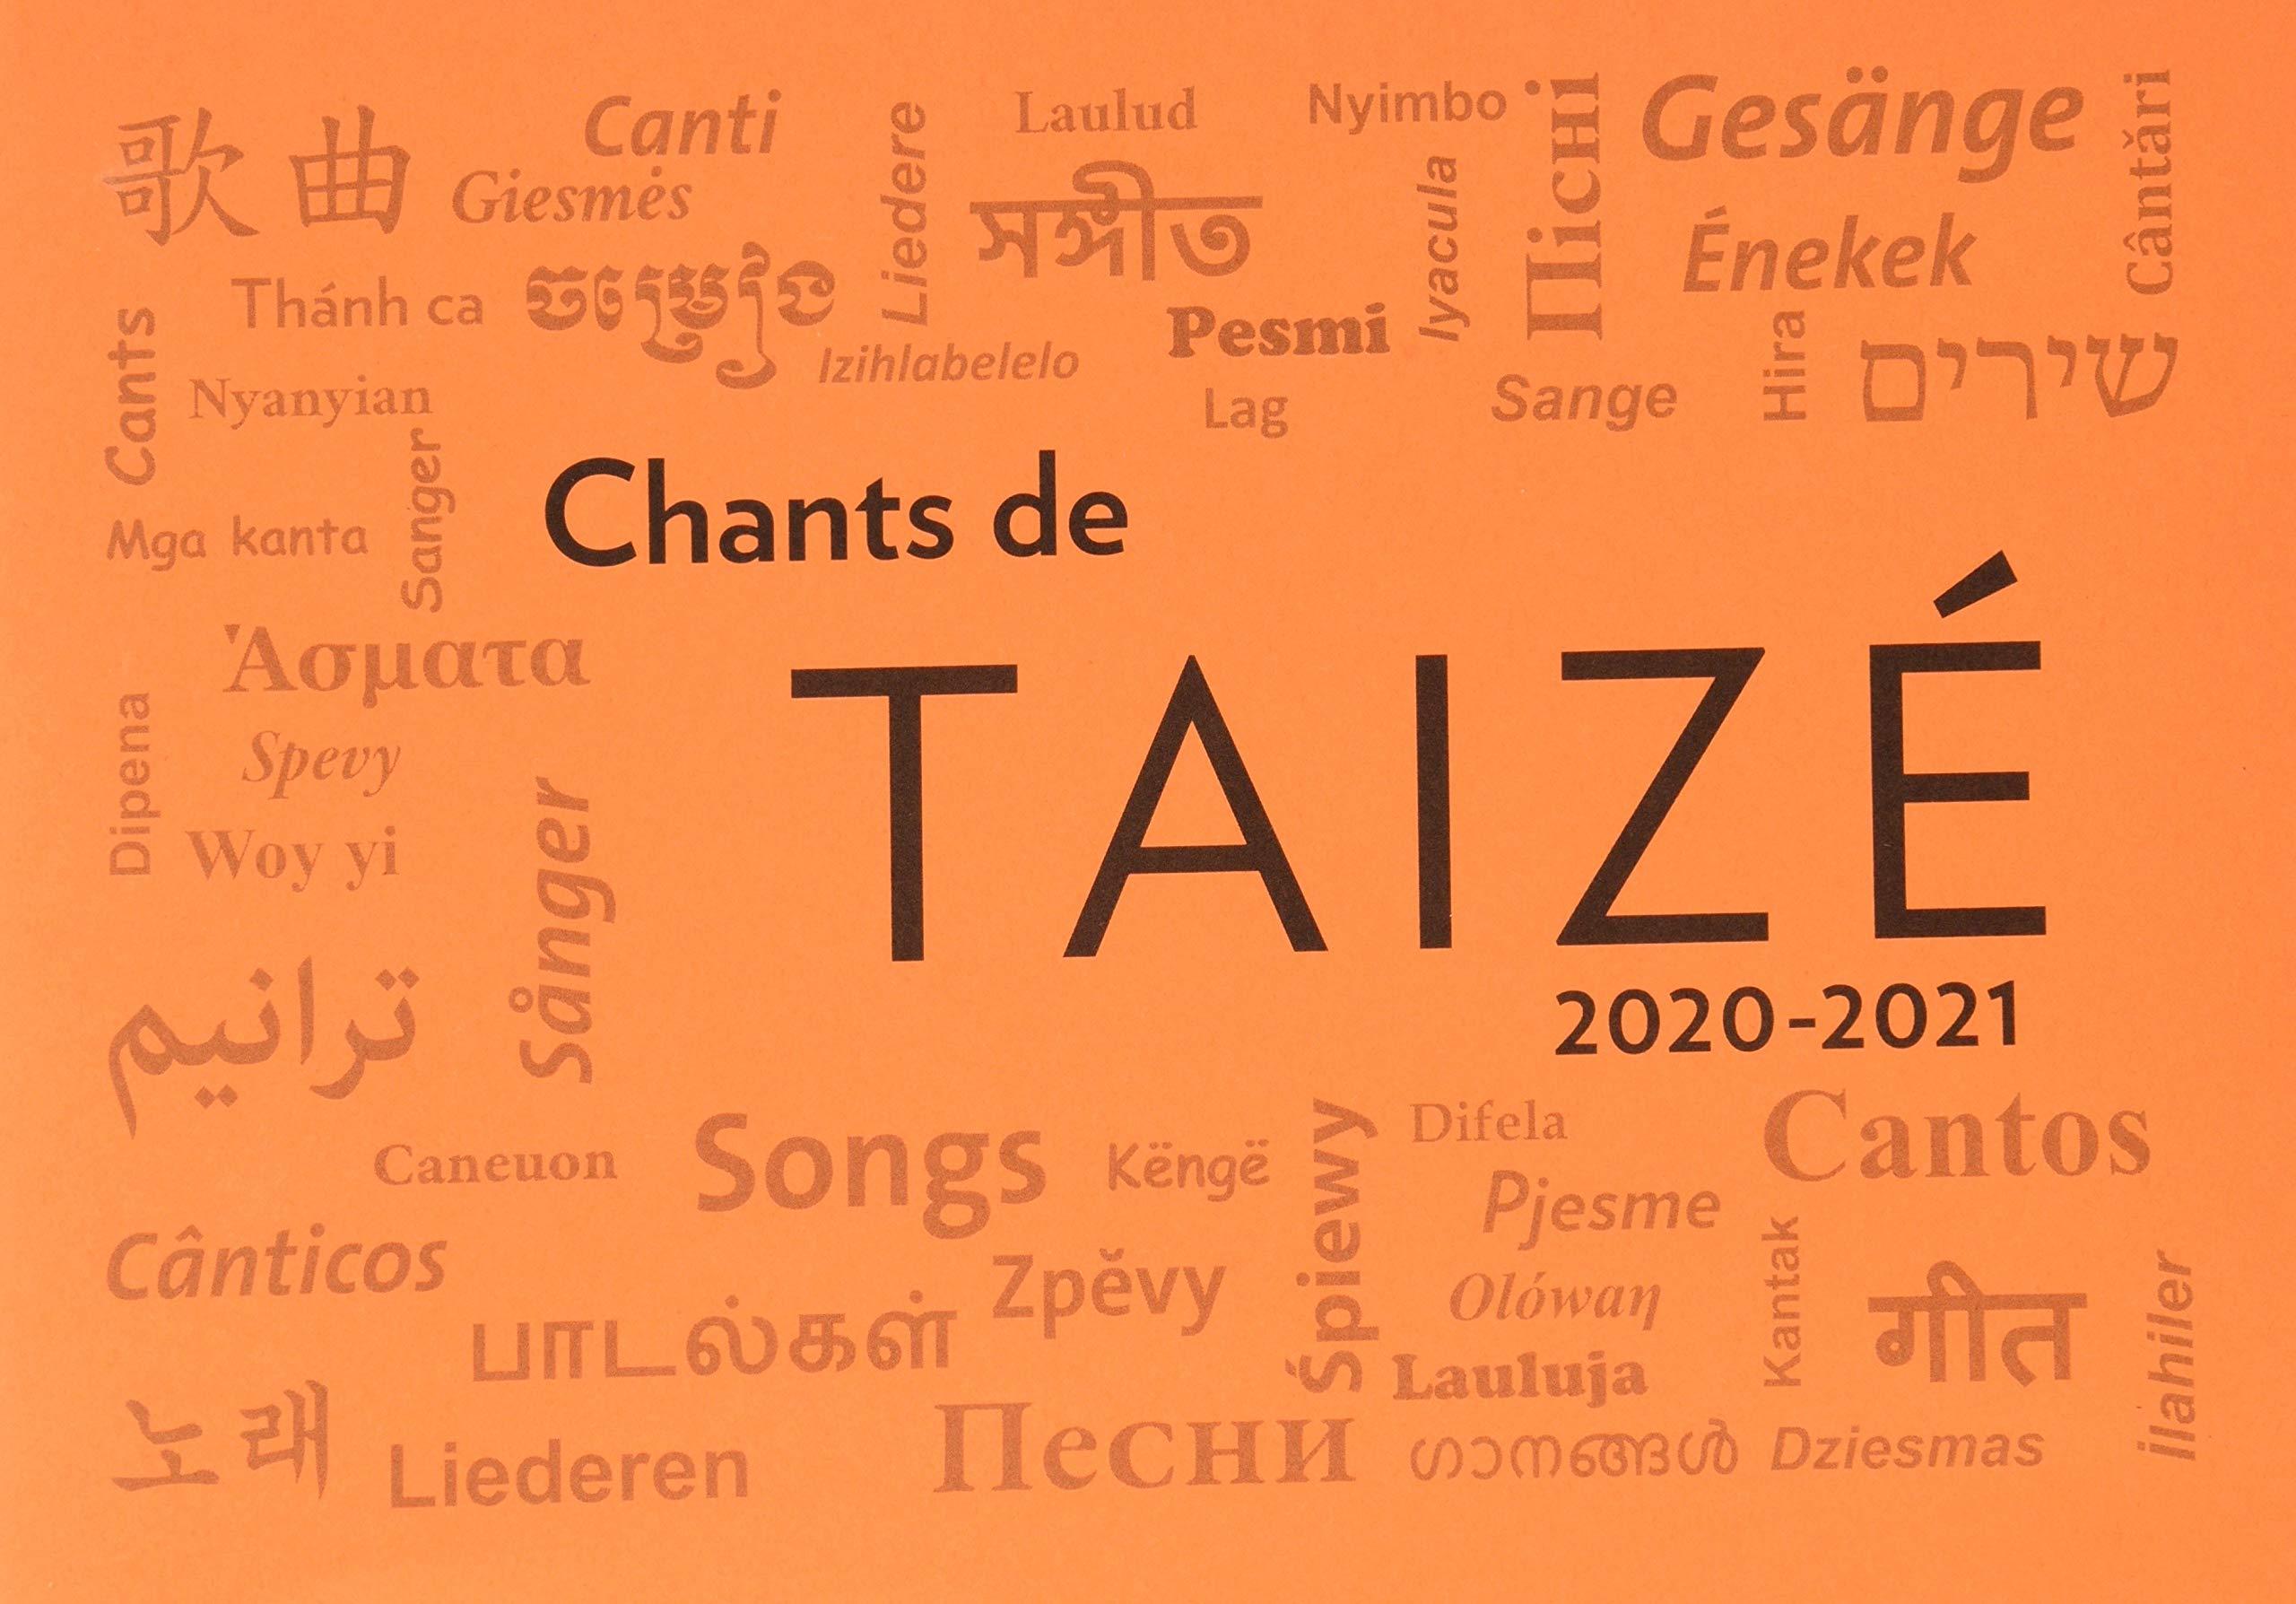 rencontres internationales taizé 2021